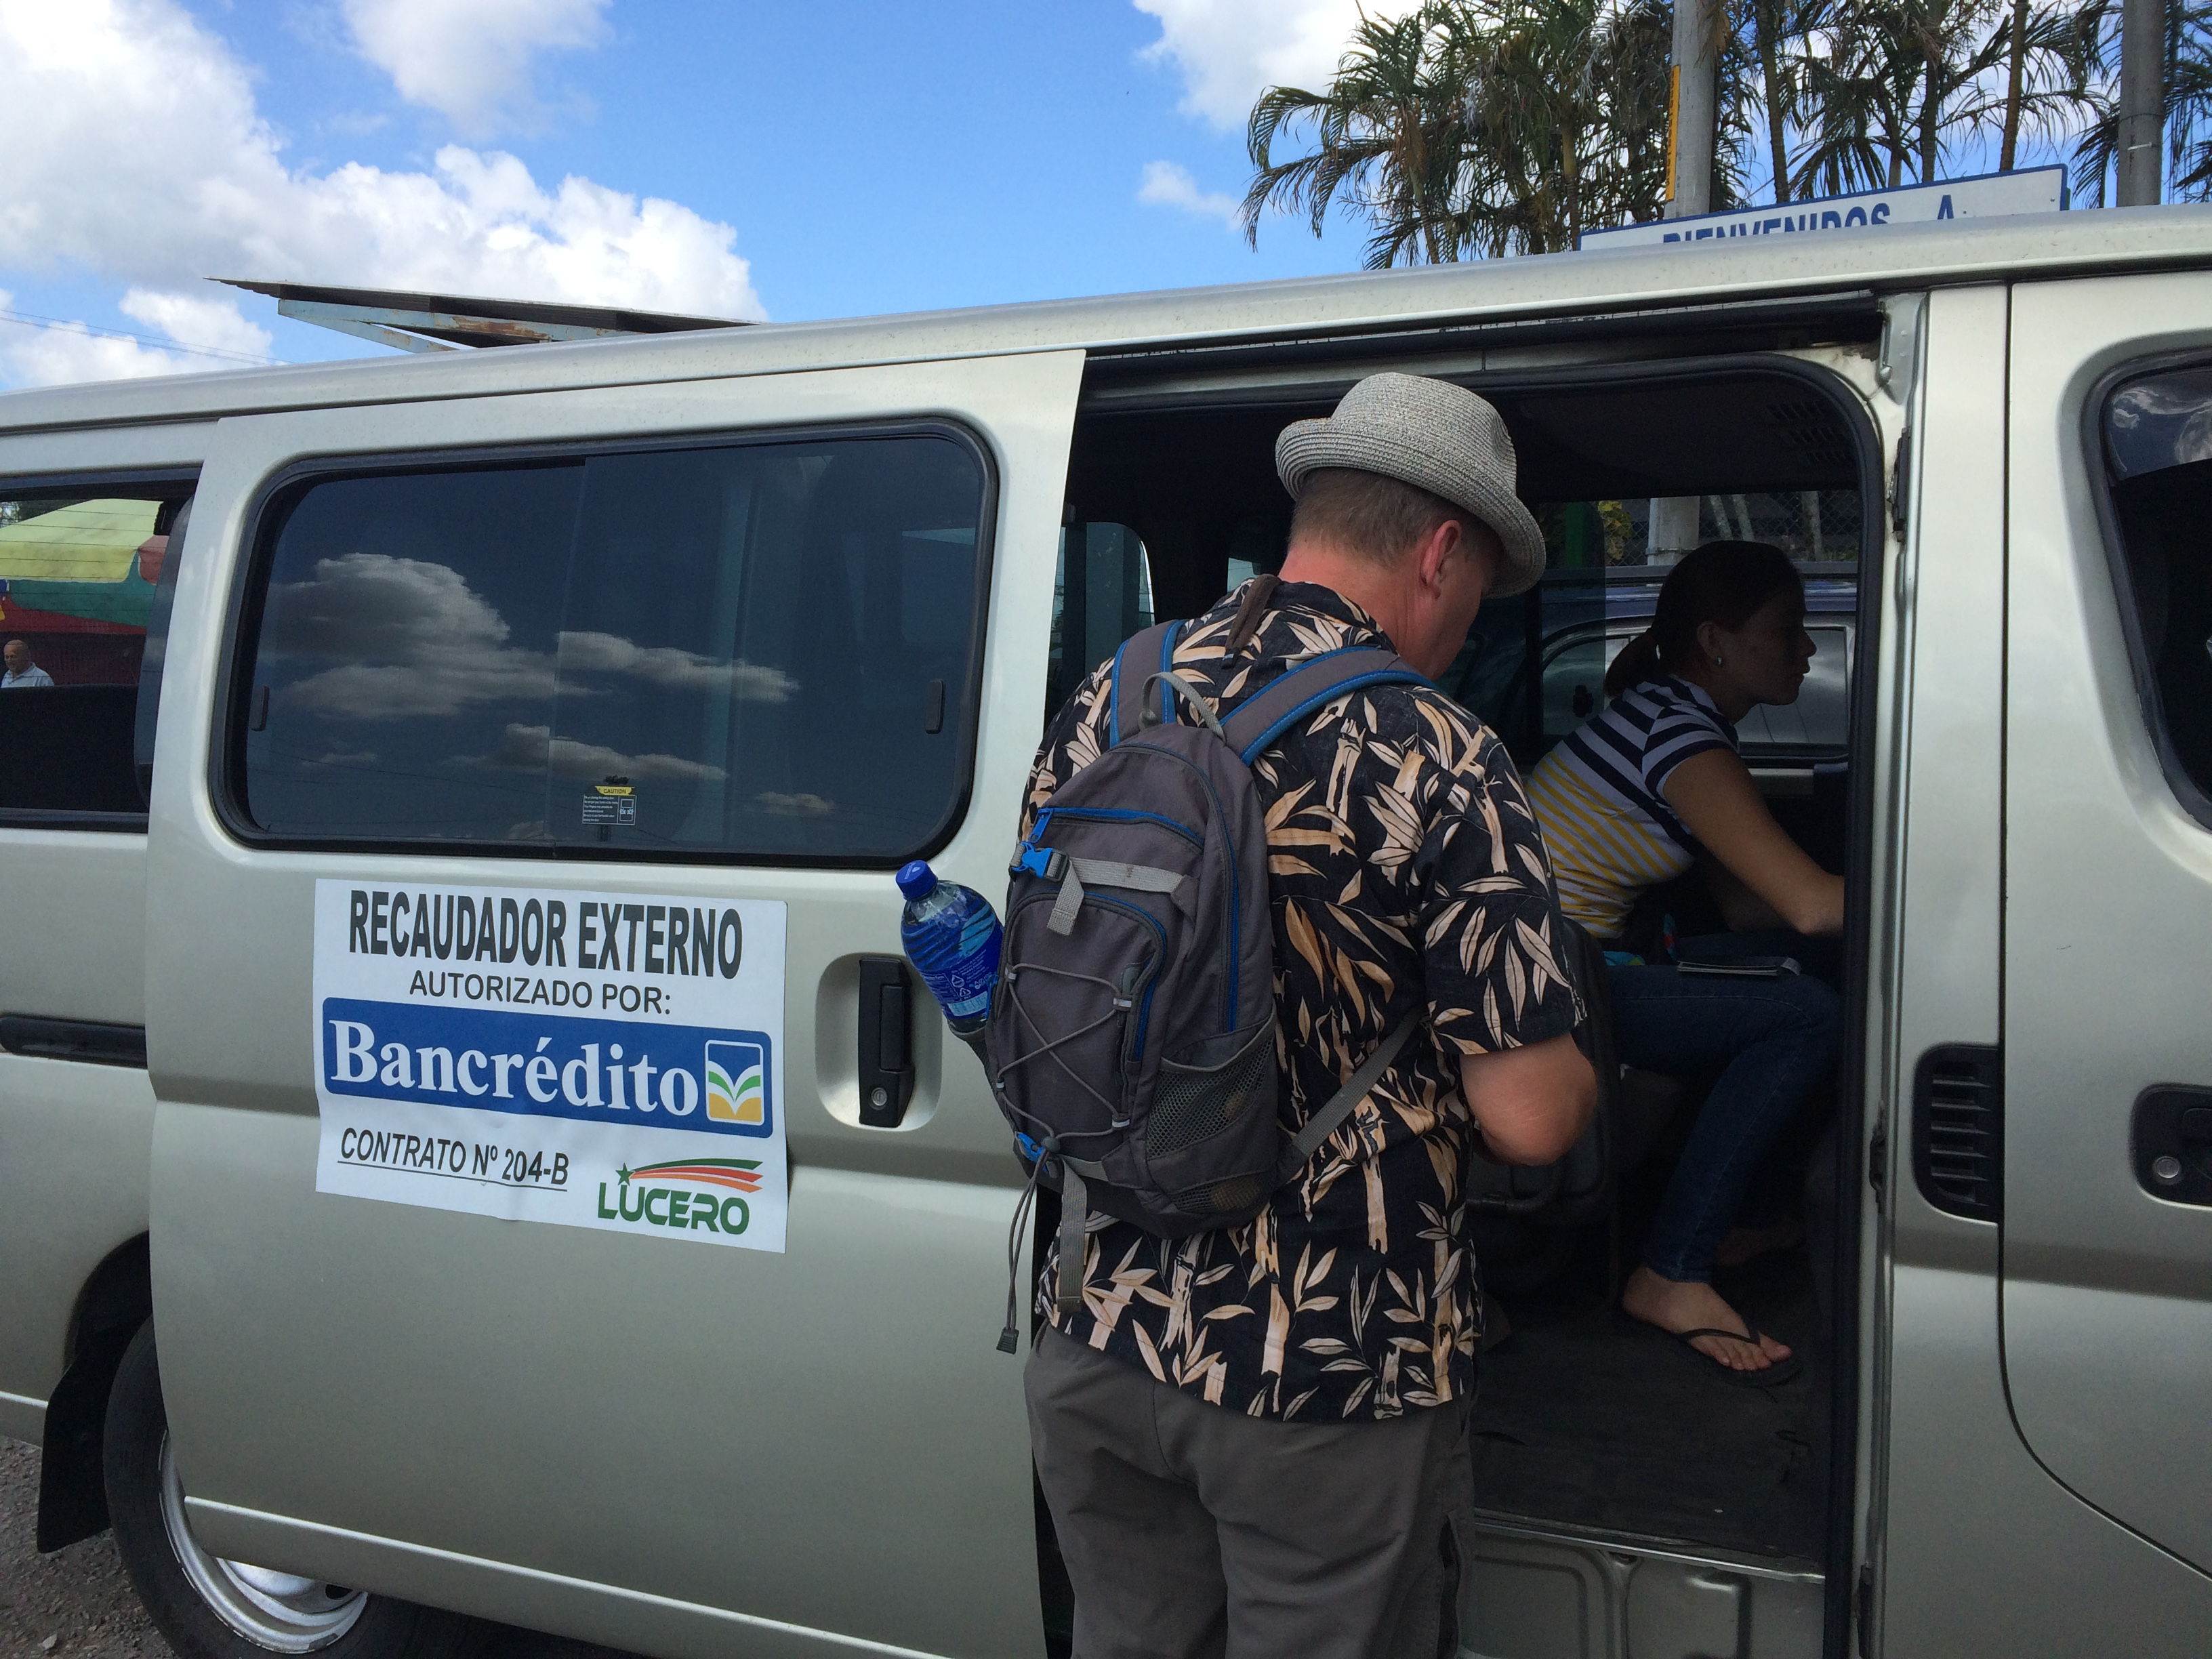 img_1058 Border Run #3 - A Quickie Panama The Expat Life